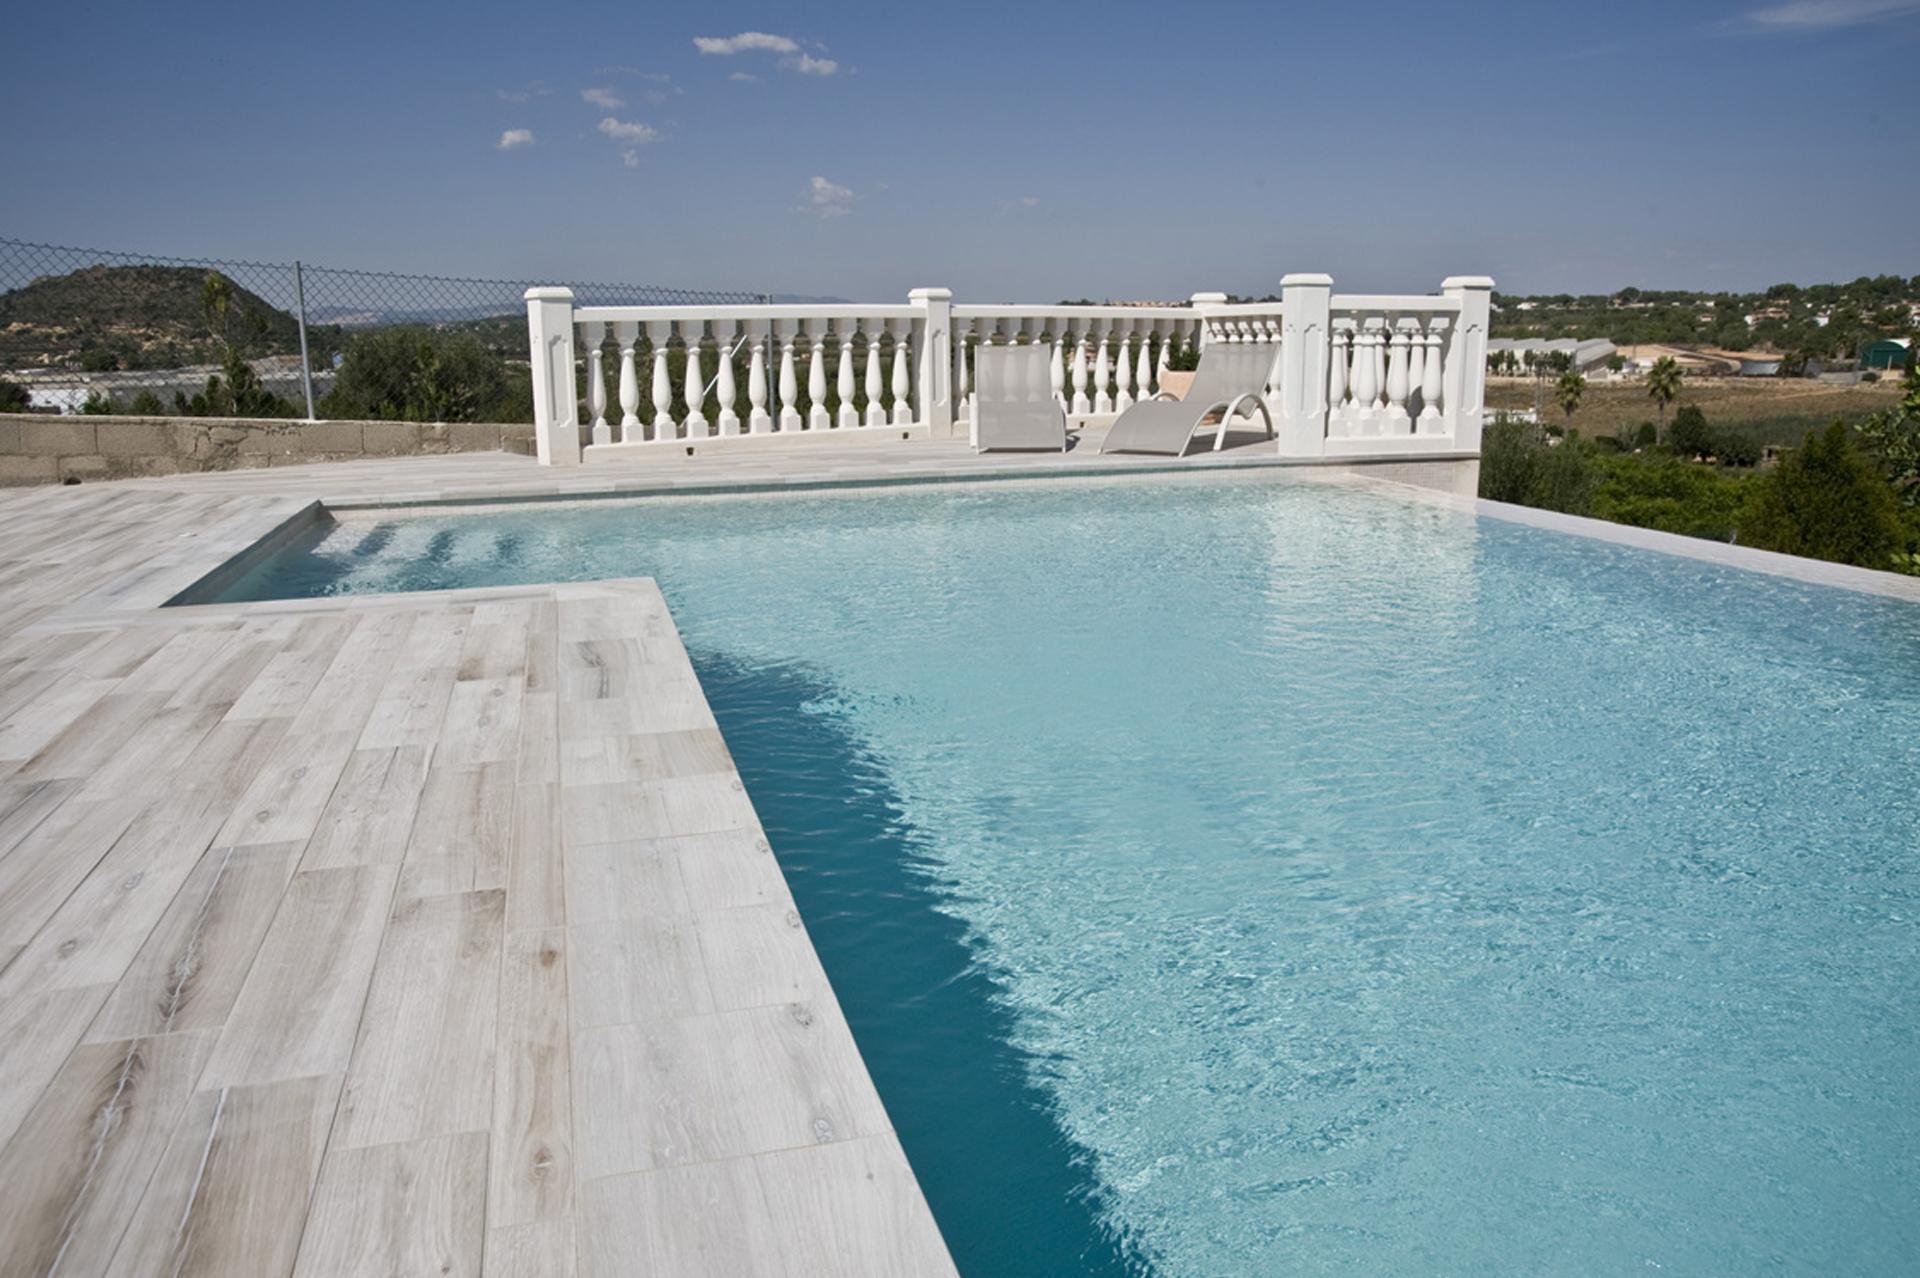 reforma_piscina_2_6